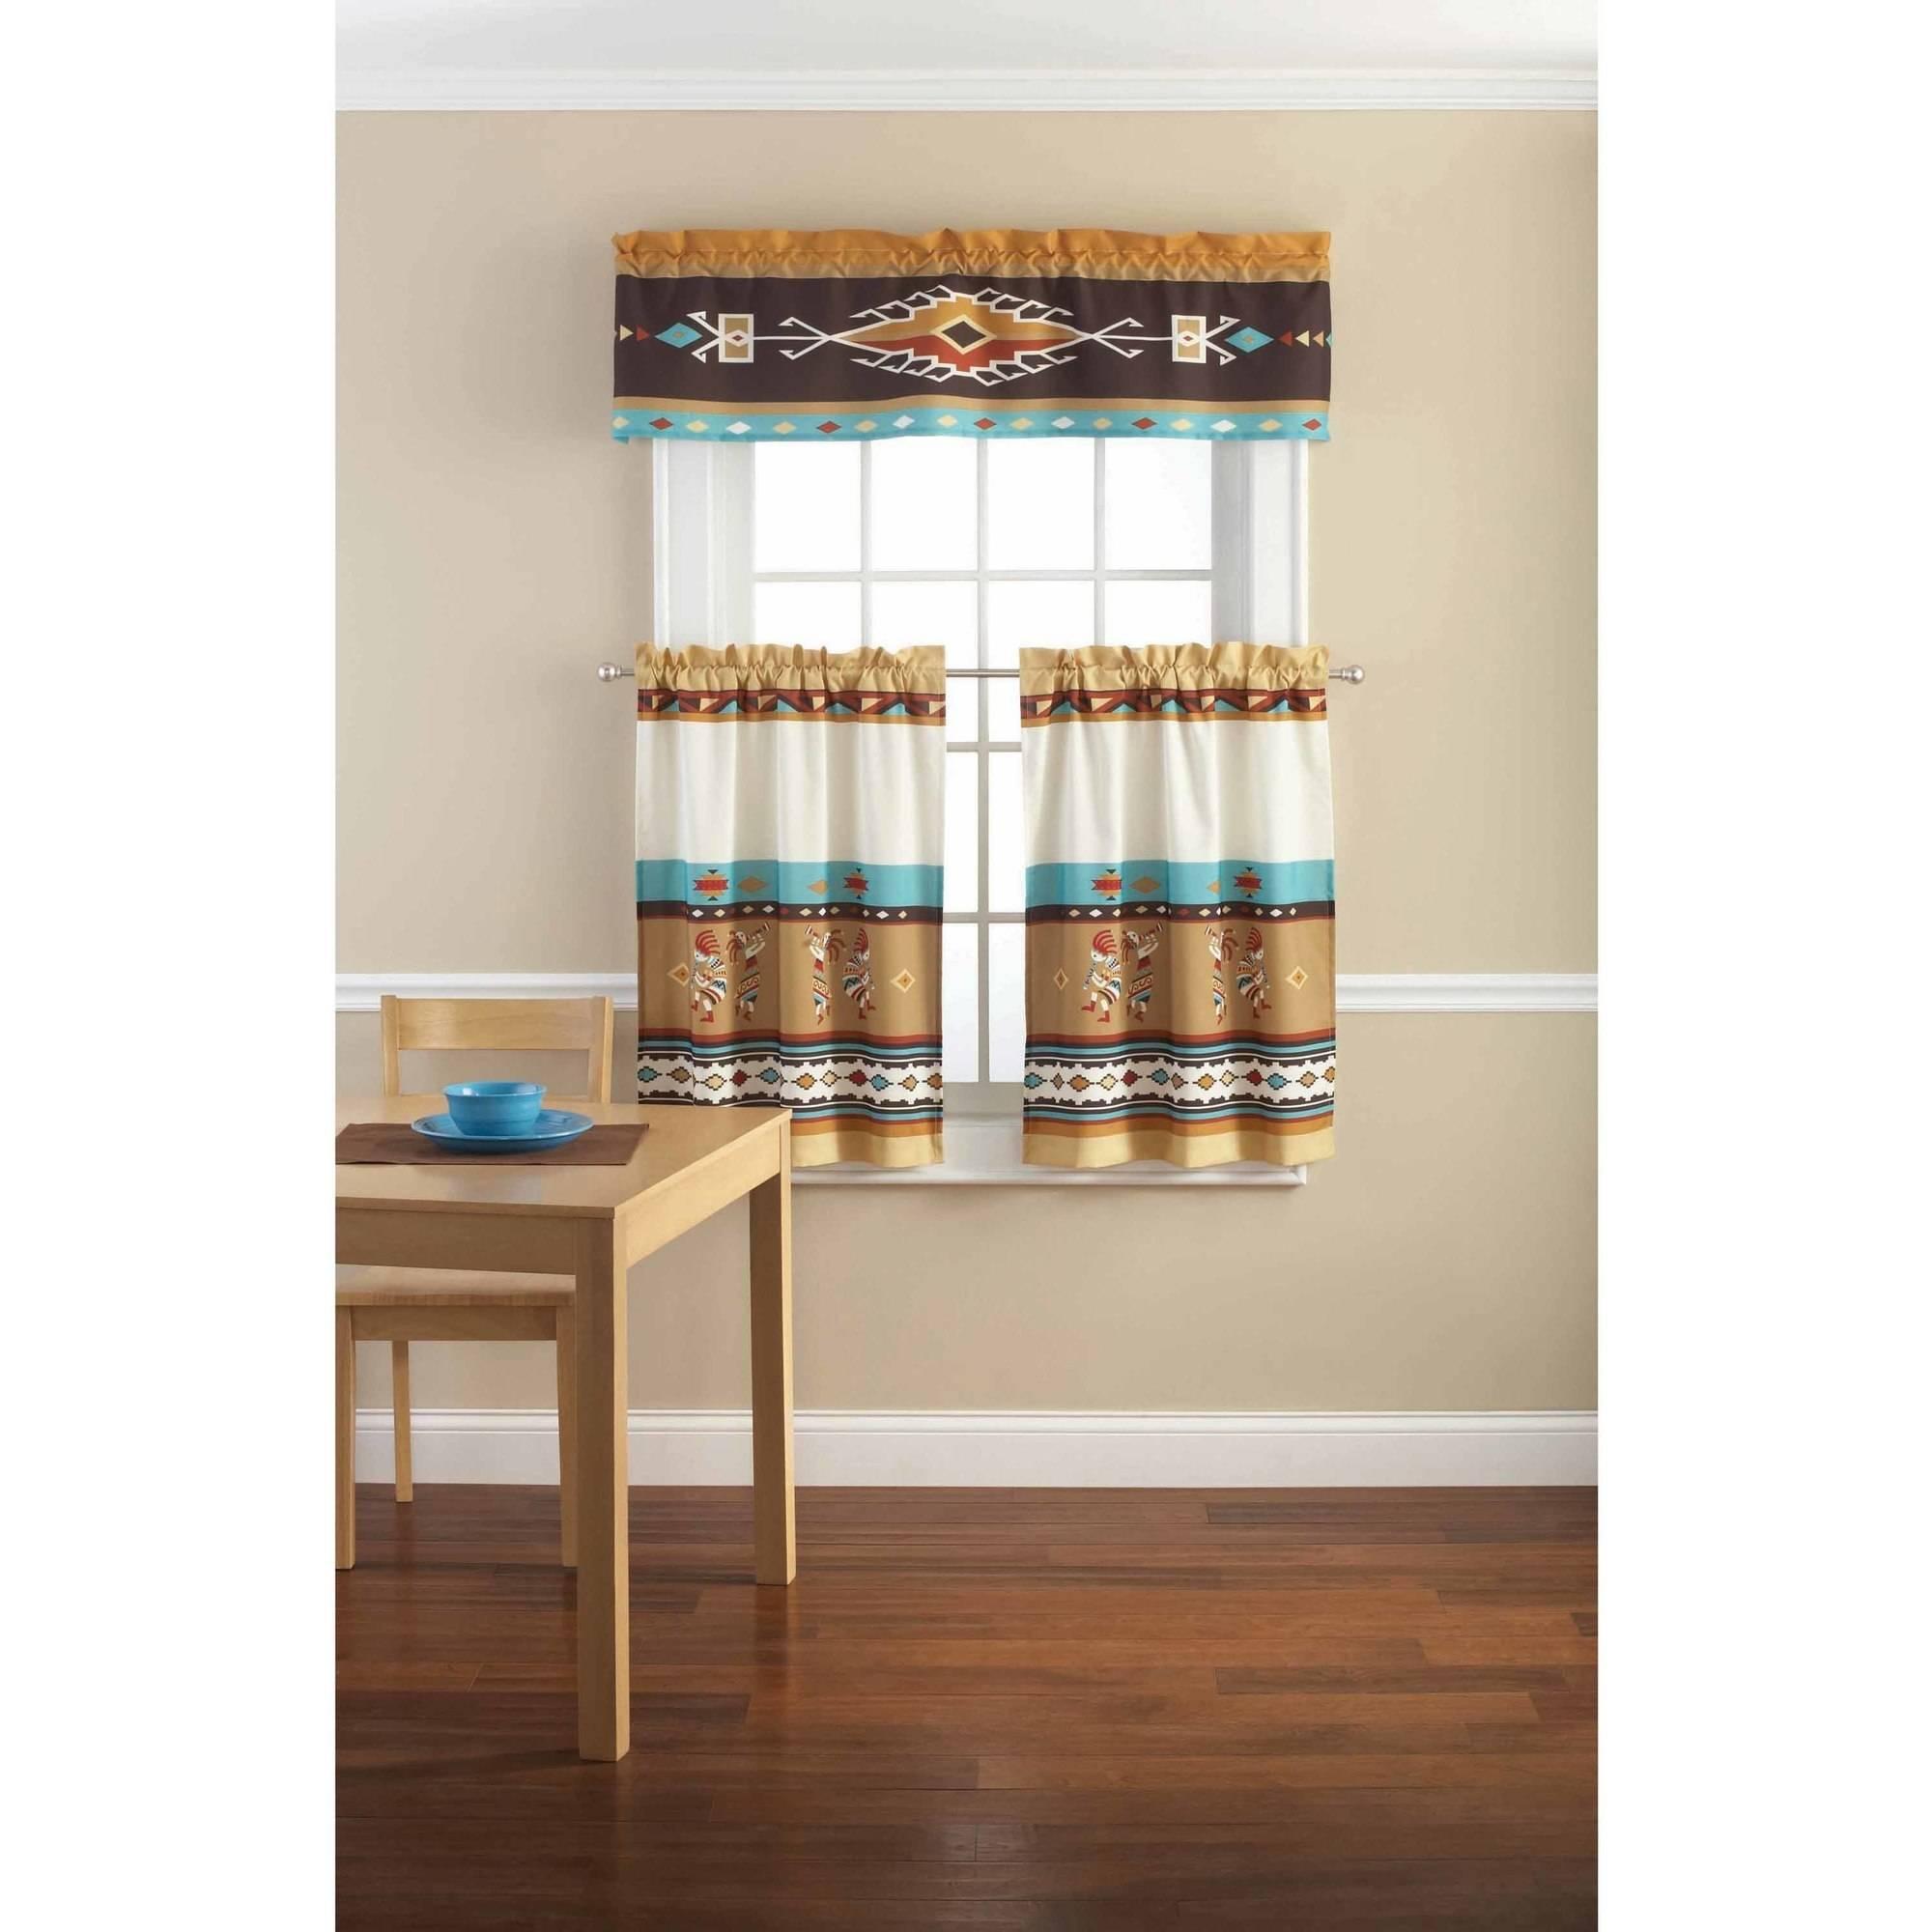 Mainstays Kokopelli Printed Valance And Kitchen Curtains Set